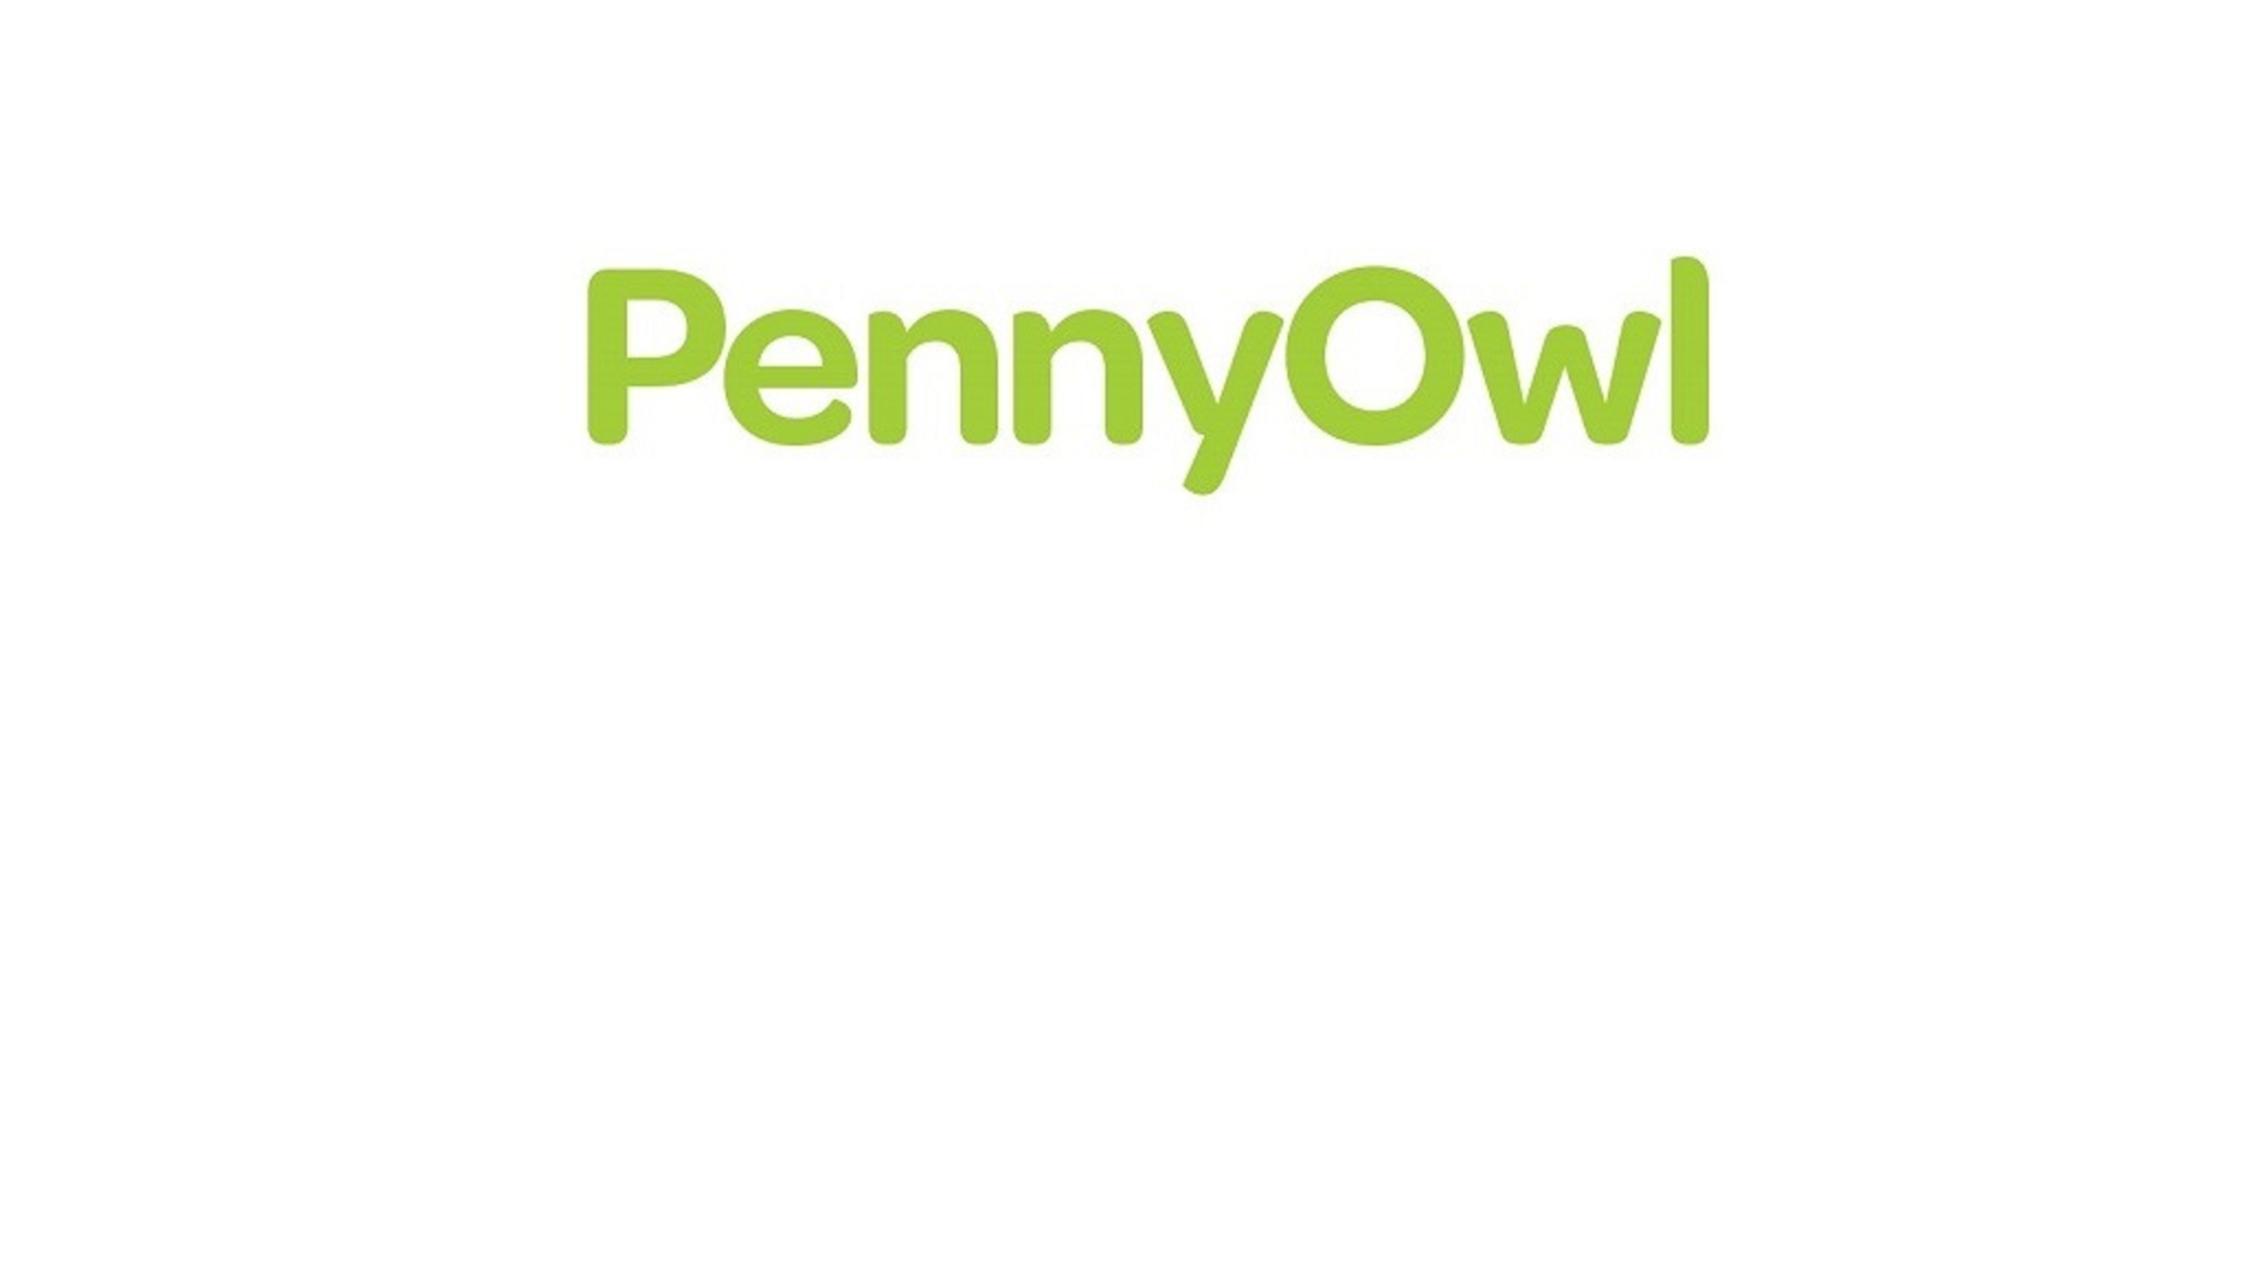 PennyOwl